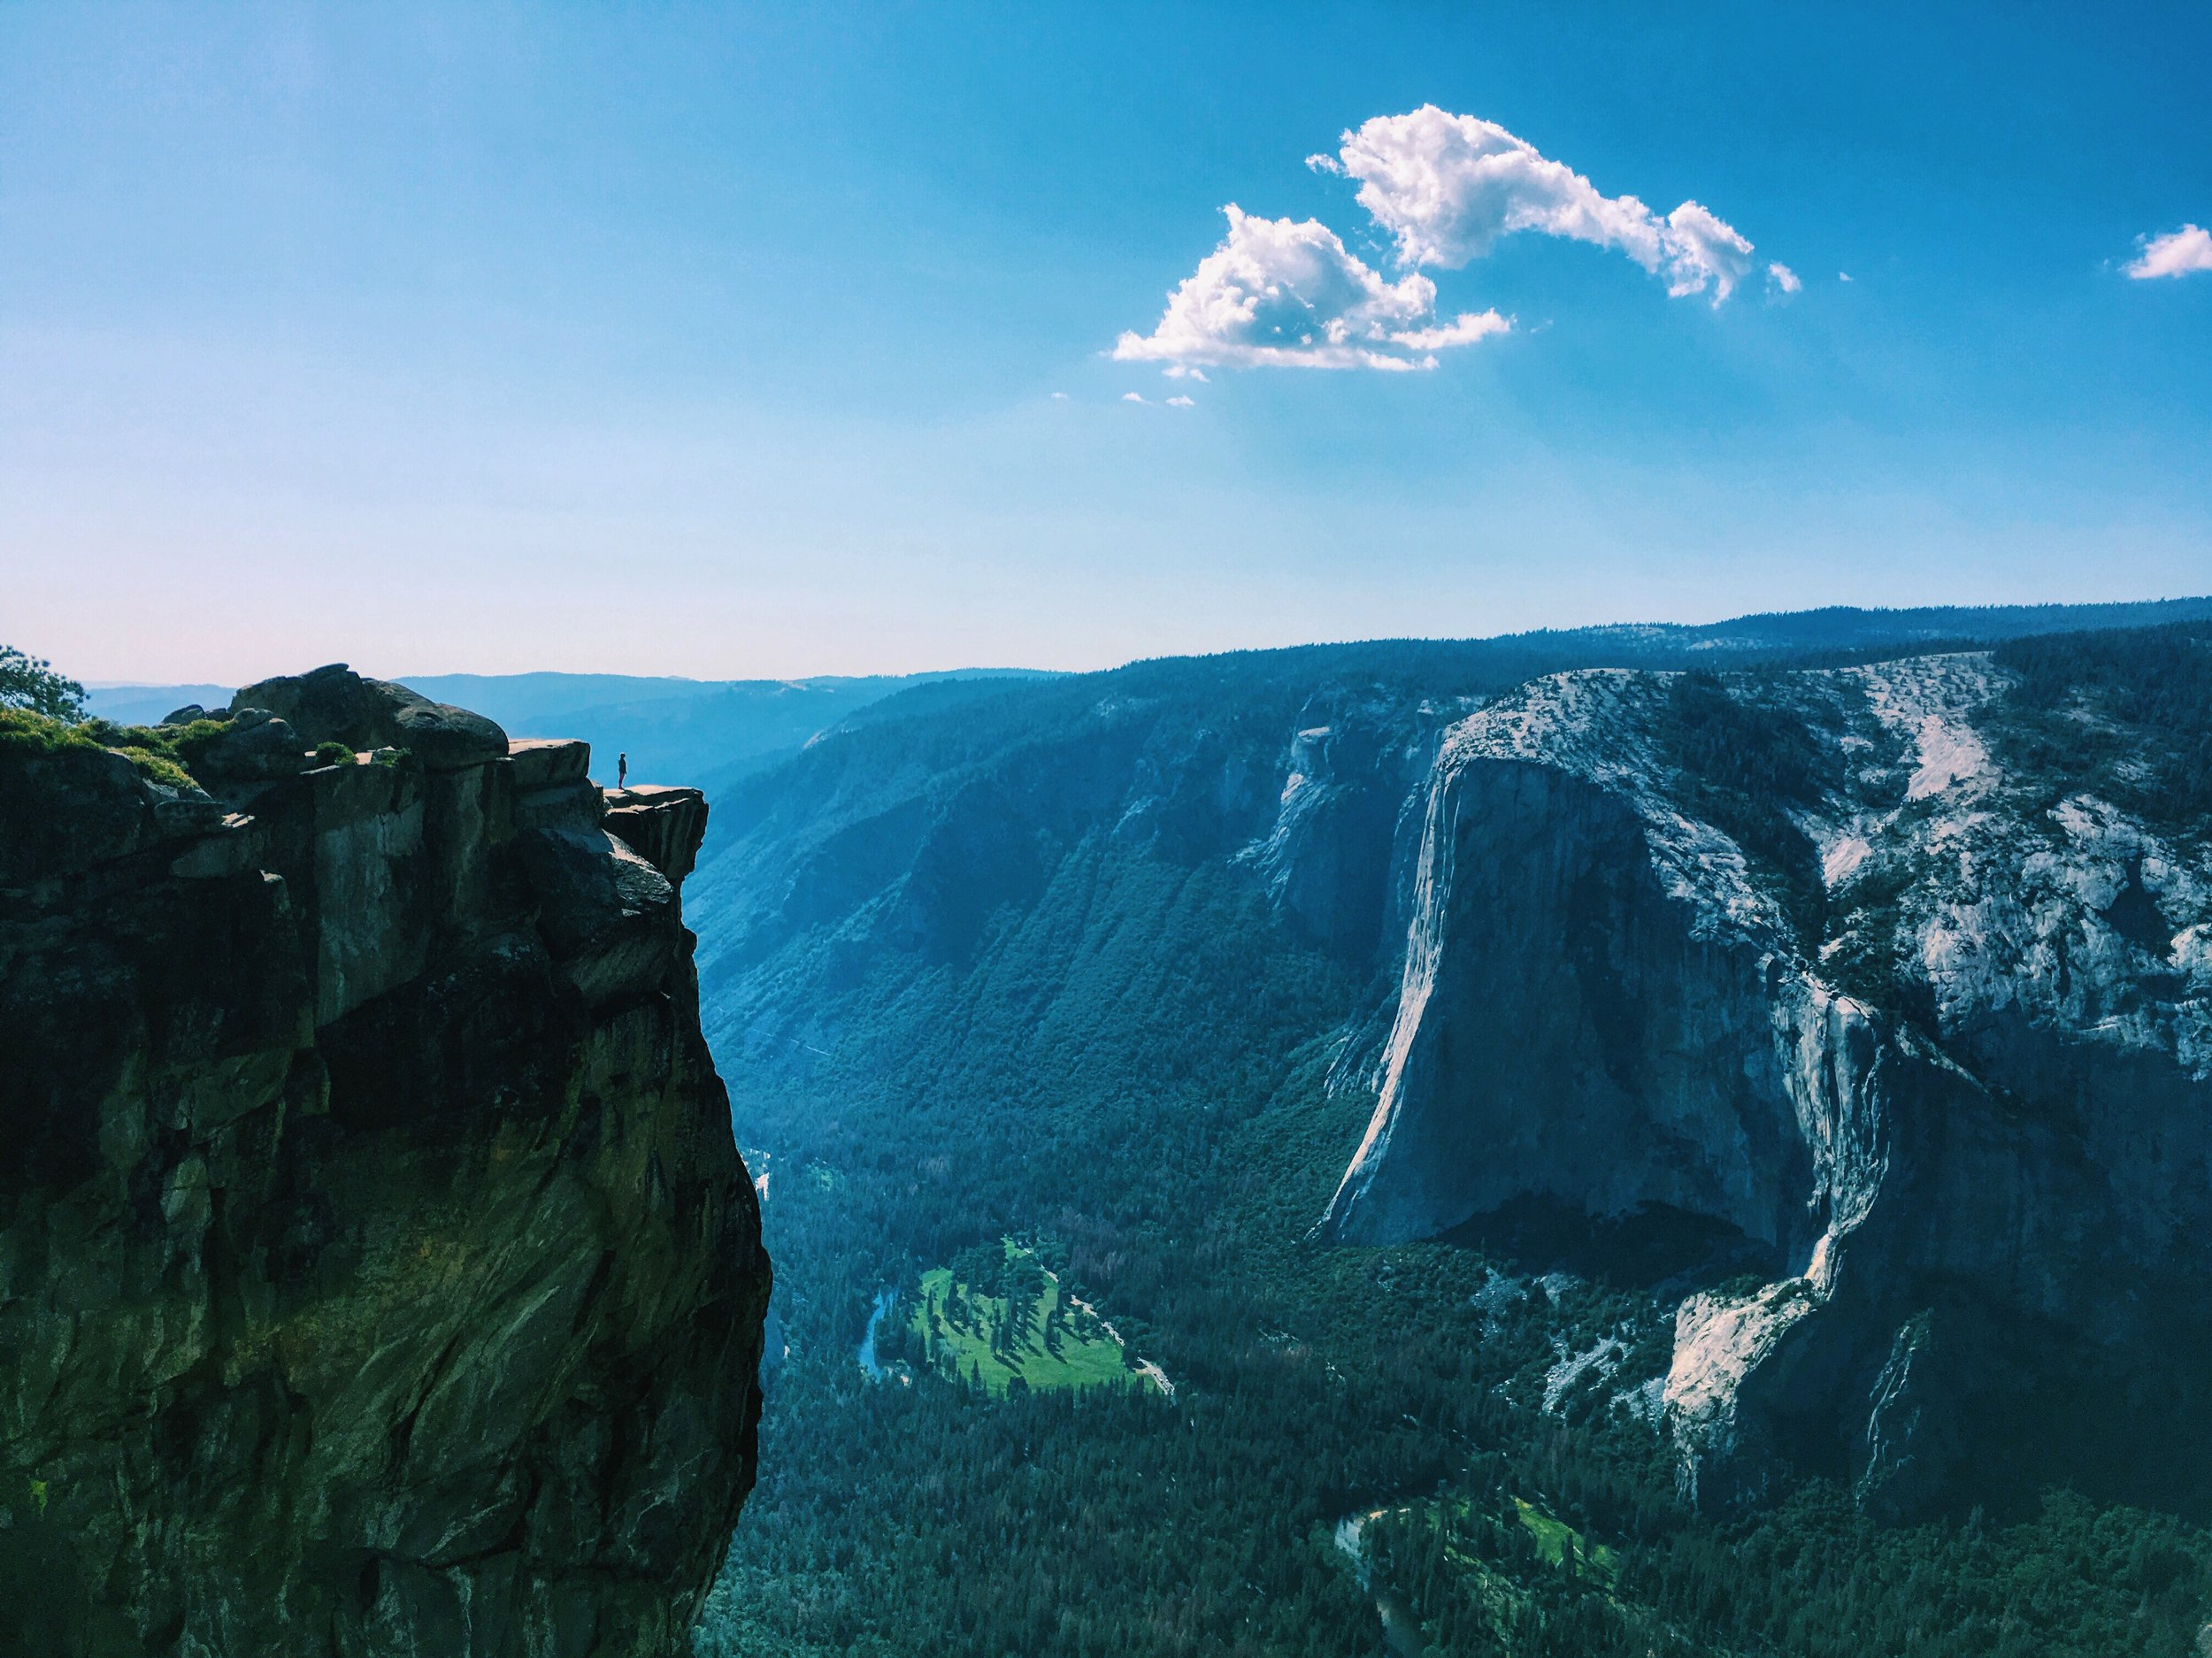 Yosemite Mammoth Eastern Sierra California Trail Running Vacation